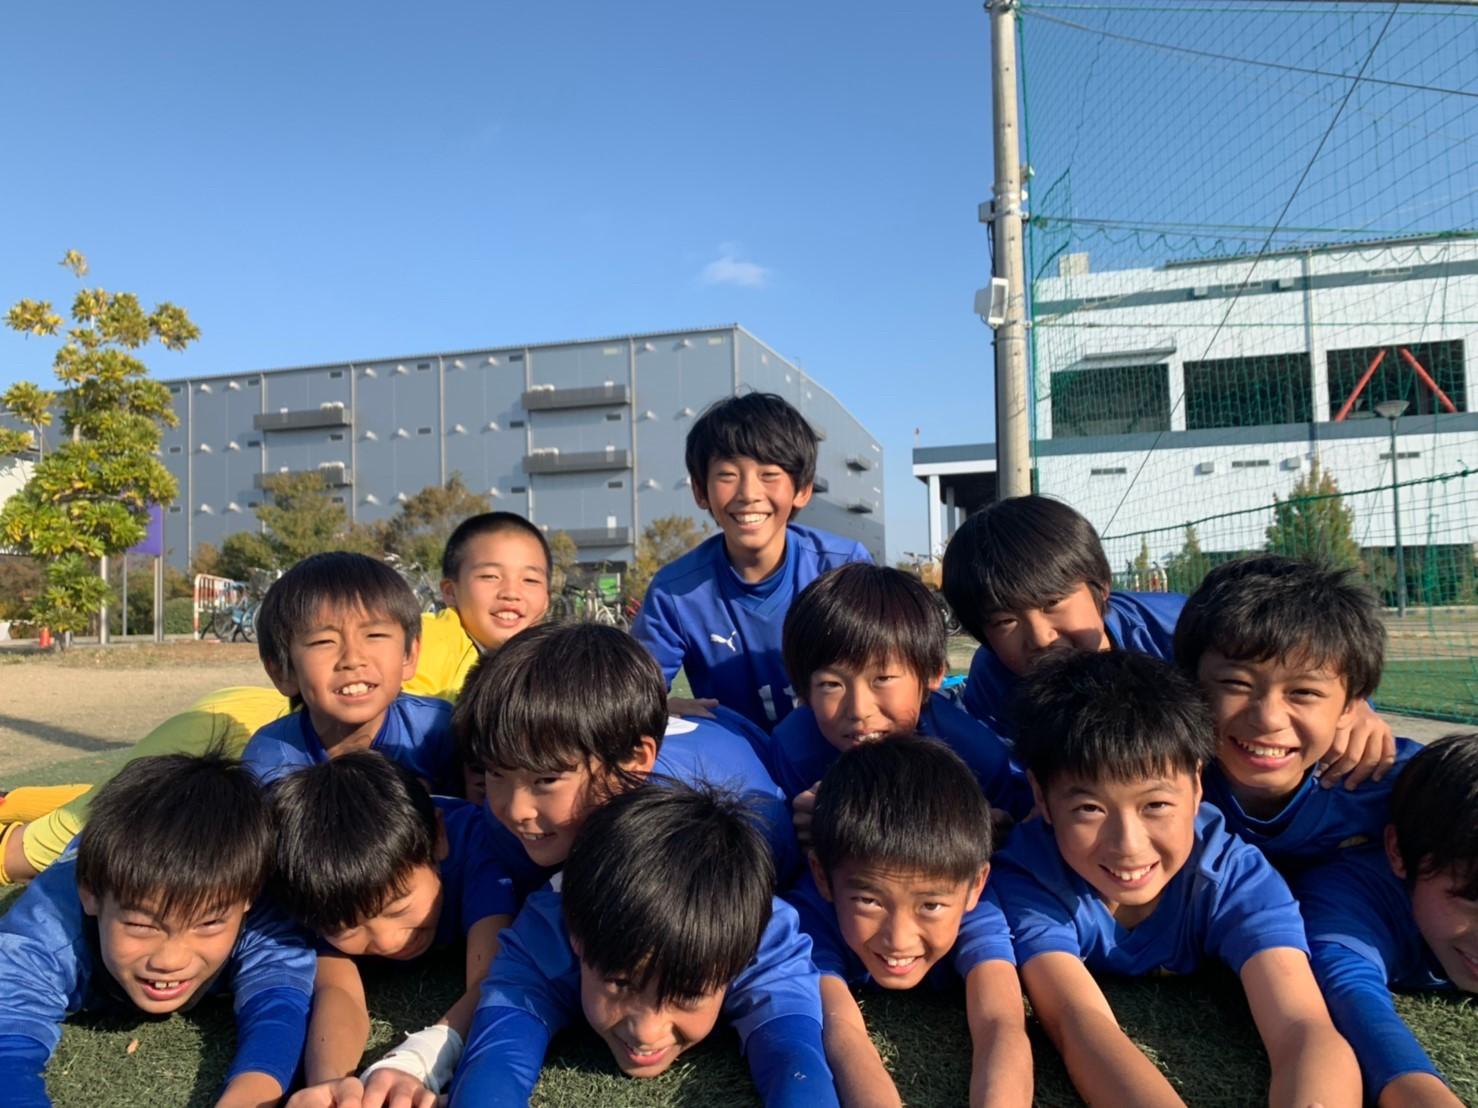 u12   全日本少年サッカー選手権 大阪府予選中央大会_f0138335_17110575.jpeg